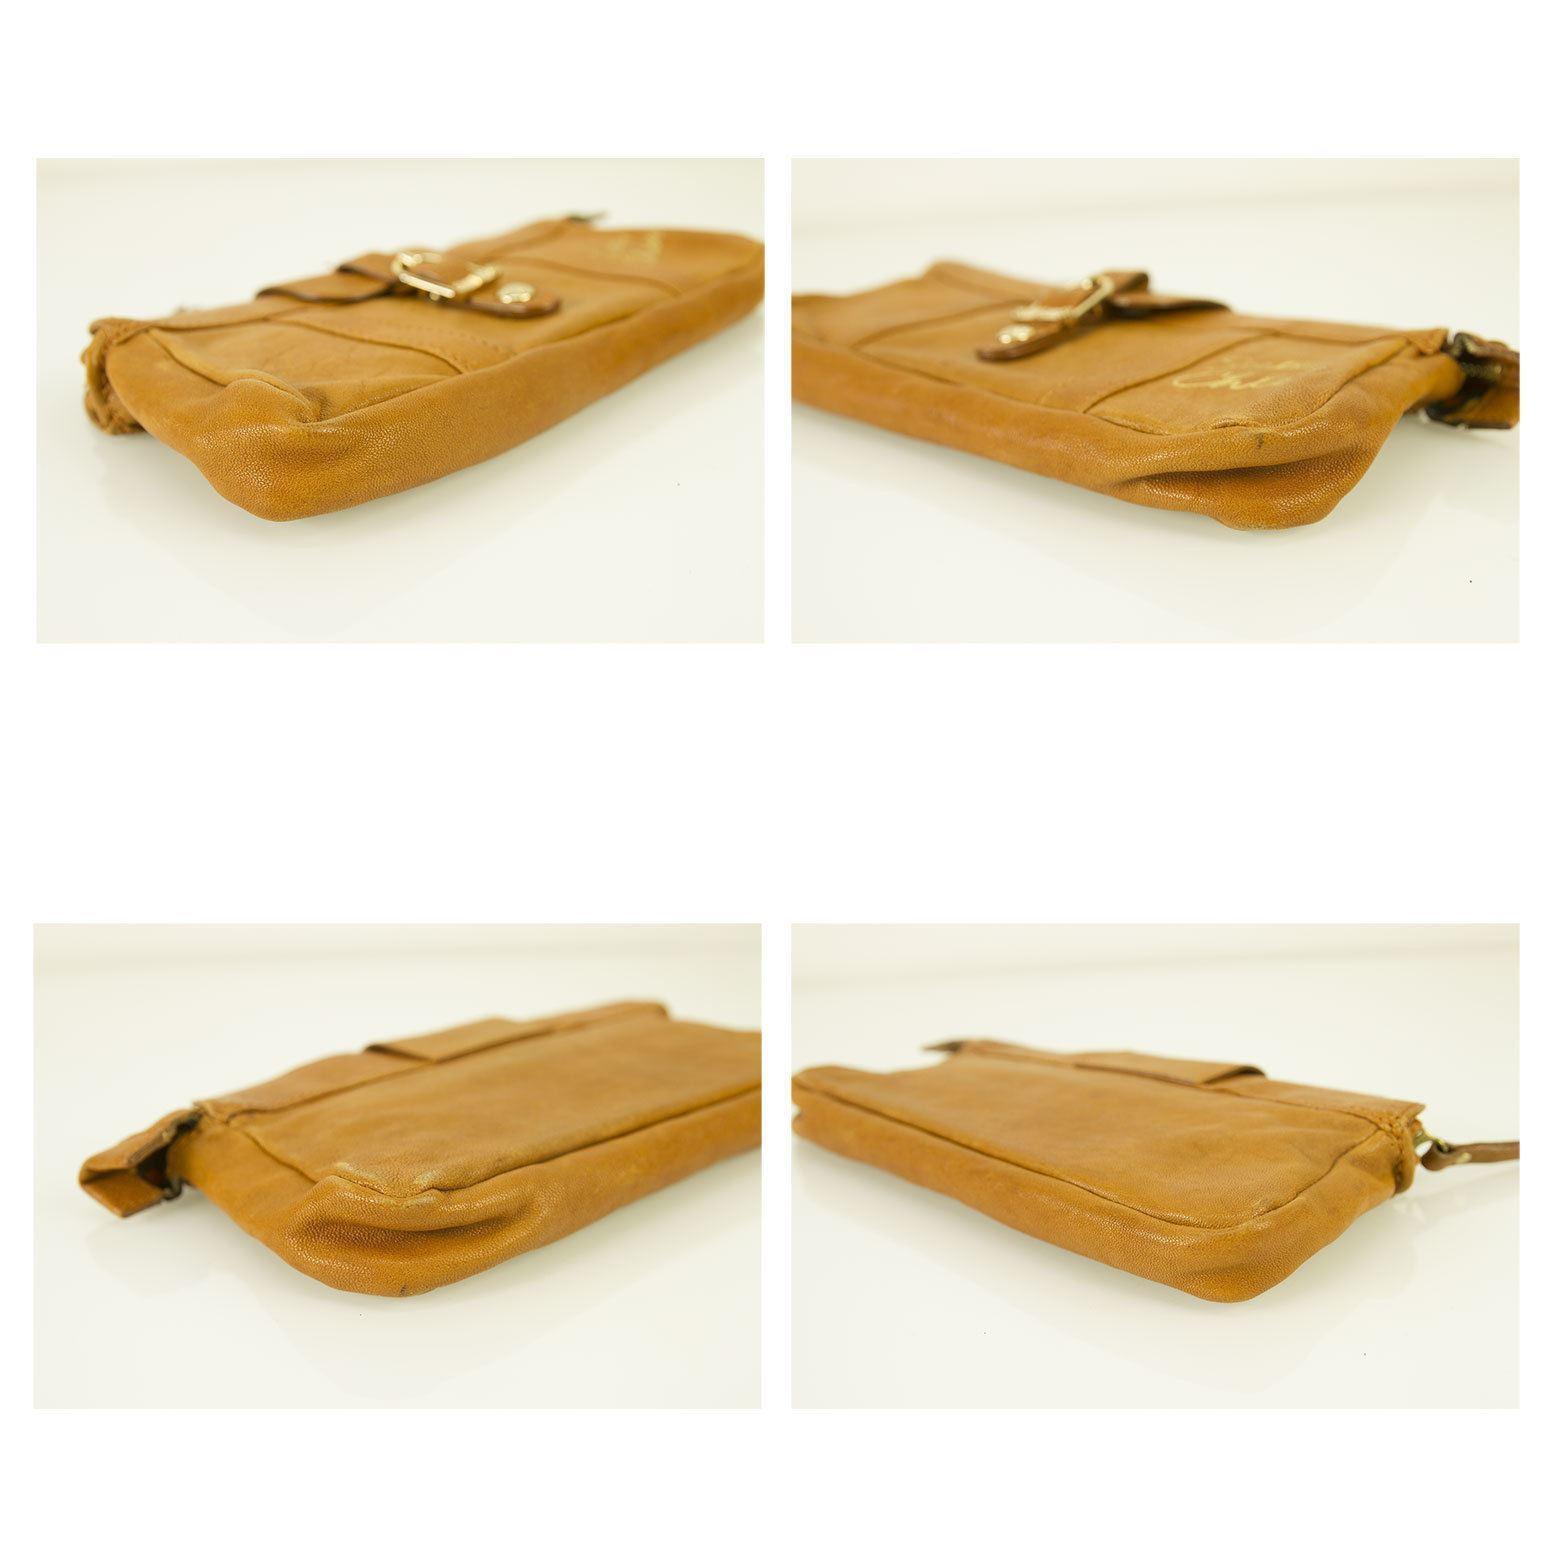 See by Chloe Tan Leather Zipper Top w. Card Slots Clutch Bag Handbag or Wallet